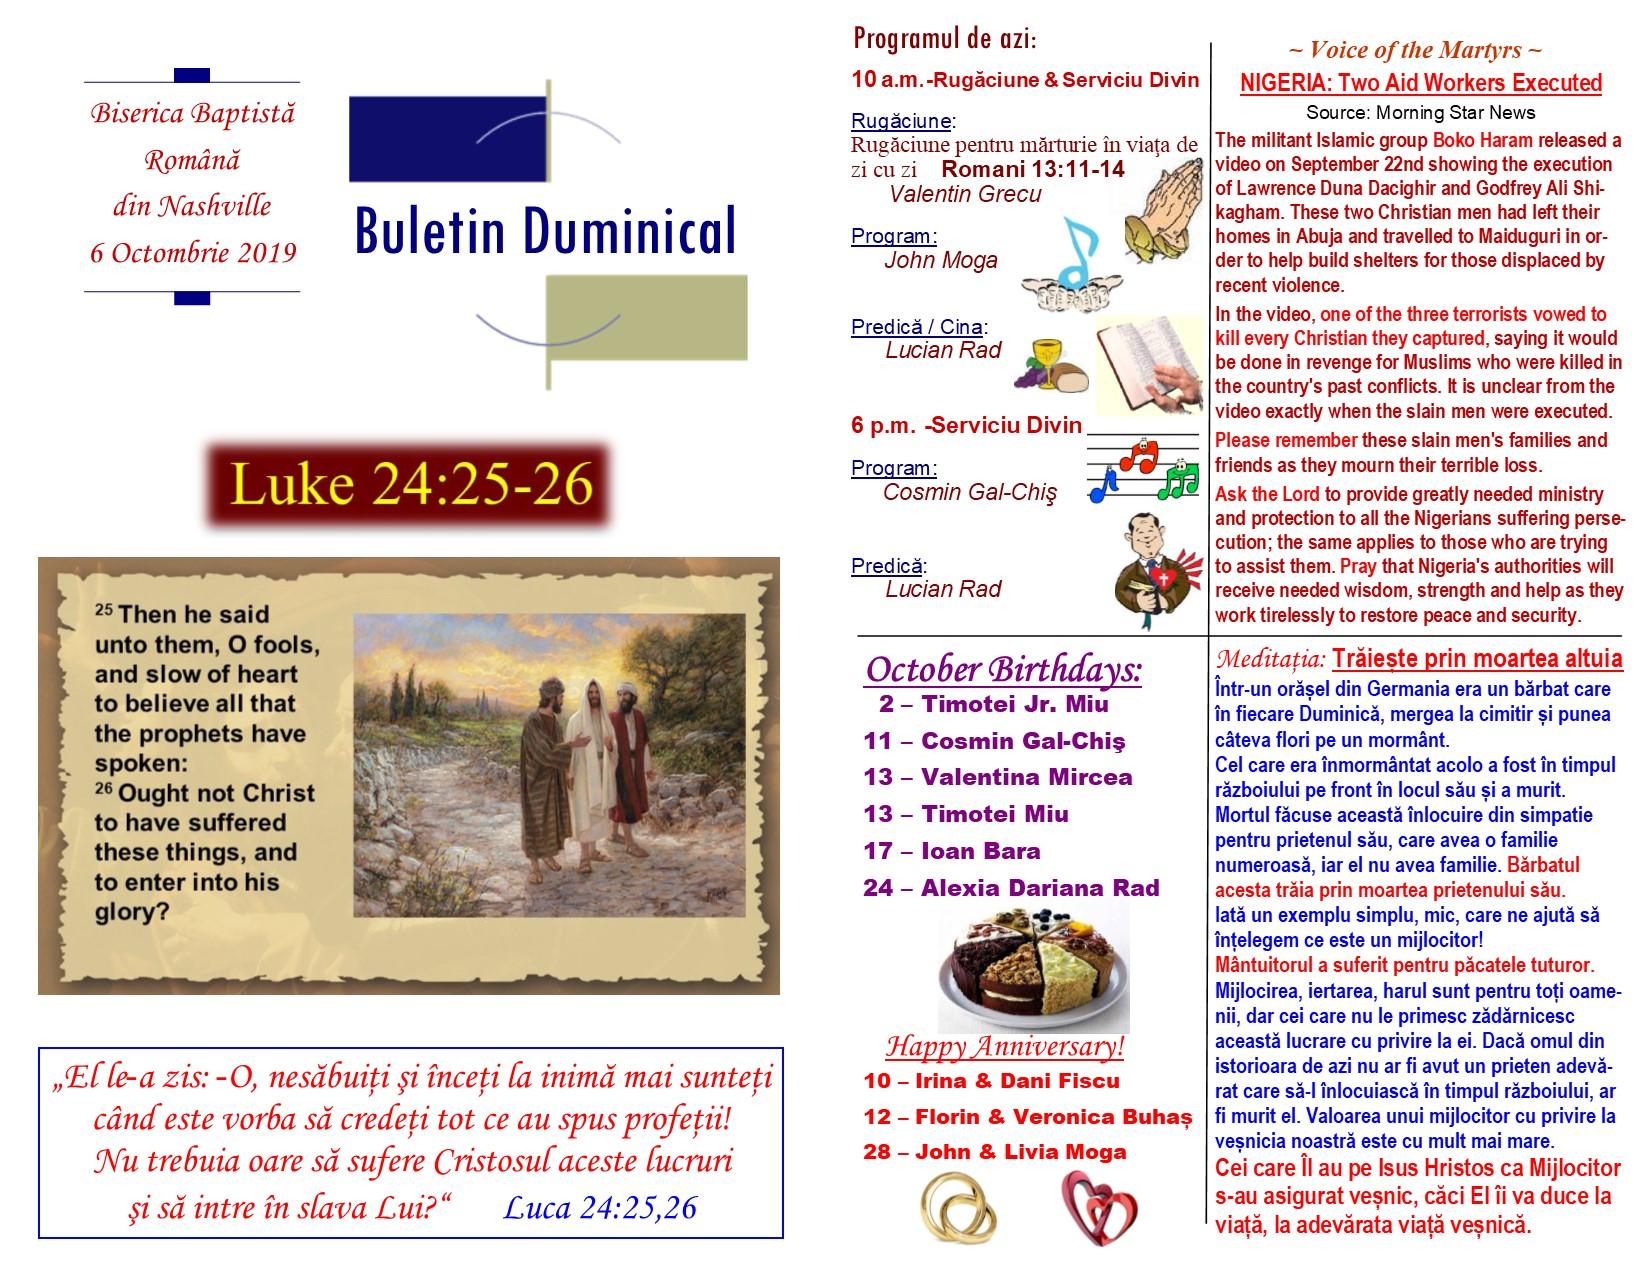 Buletin 10-06-19 page 1 & 2